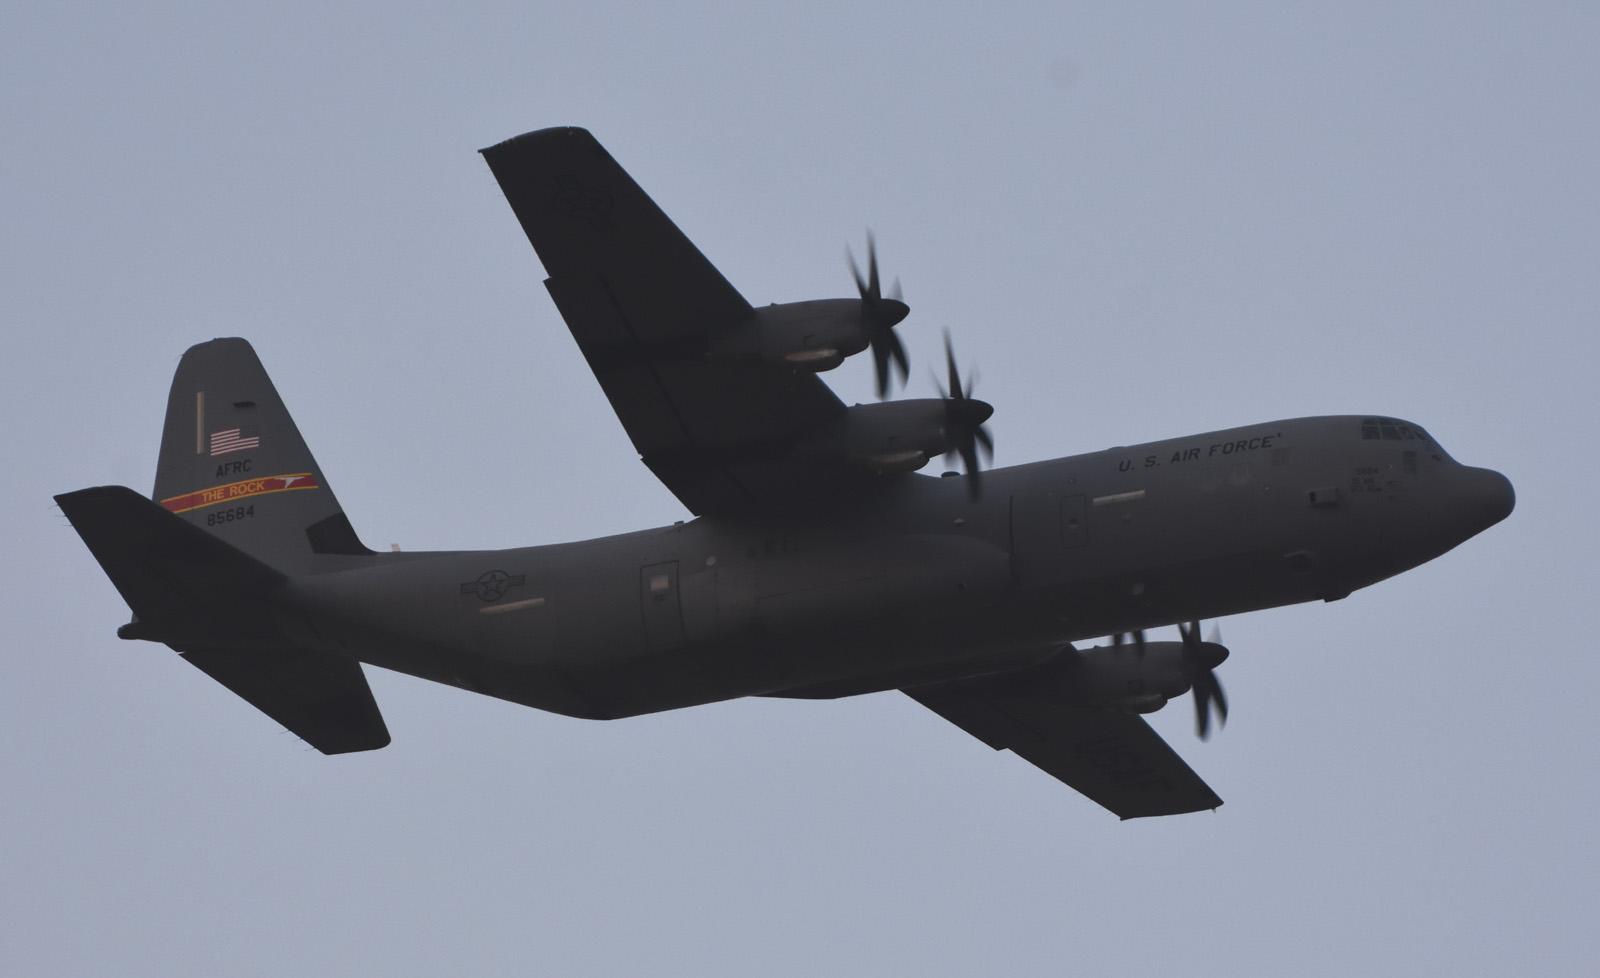 1月19日 C-130J-30 THE ROCK